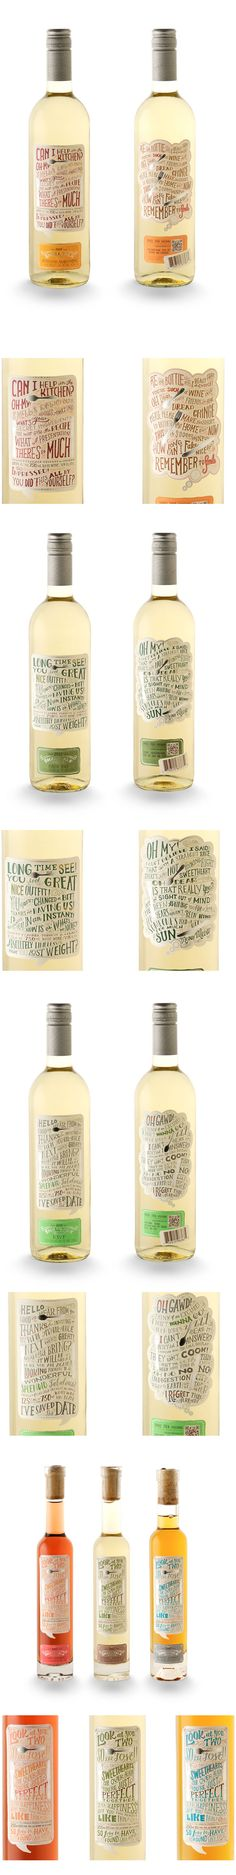 Small Talk Vineyard Too cute. Cool Packaging, Beverage Packaging, Bottle Packaging, Brand Packaging, Design Packaging, Wine Bottle Design, Wine Label Design, Wine Bottle Labels, Wine Bottles